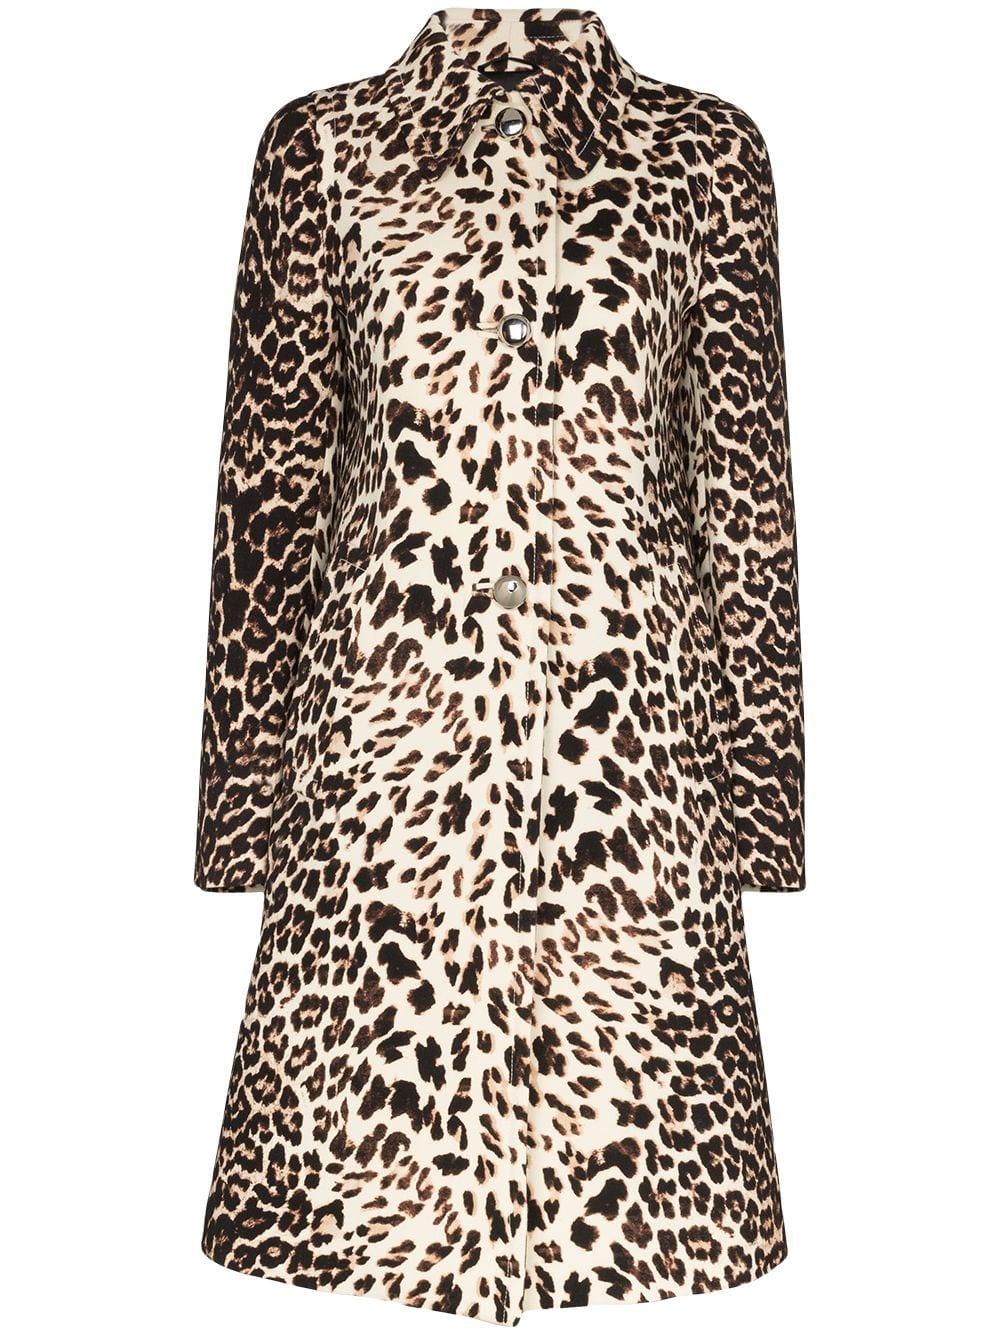 PRADA leopard-print wool coat.jpg